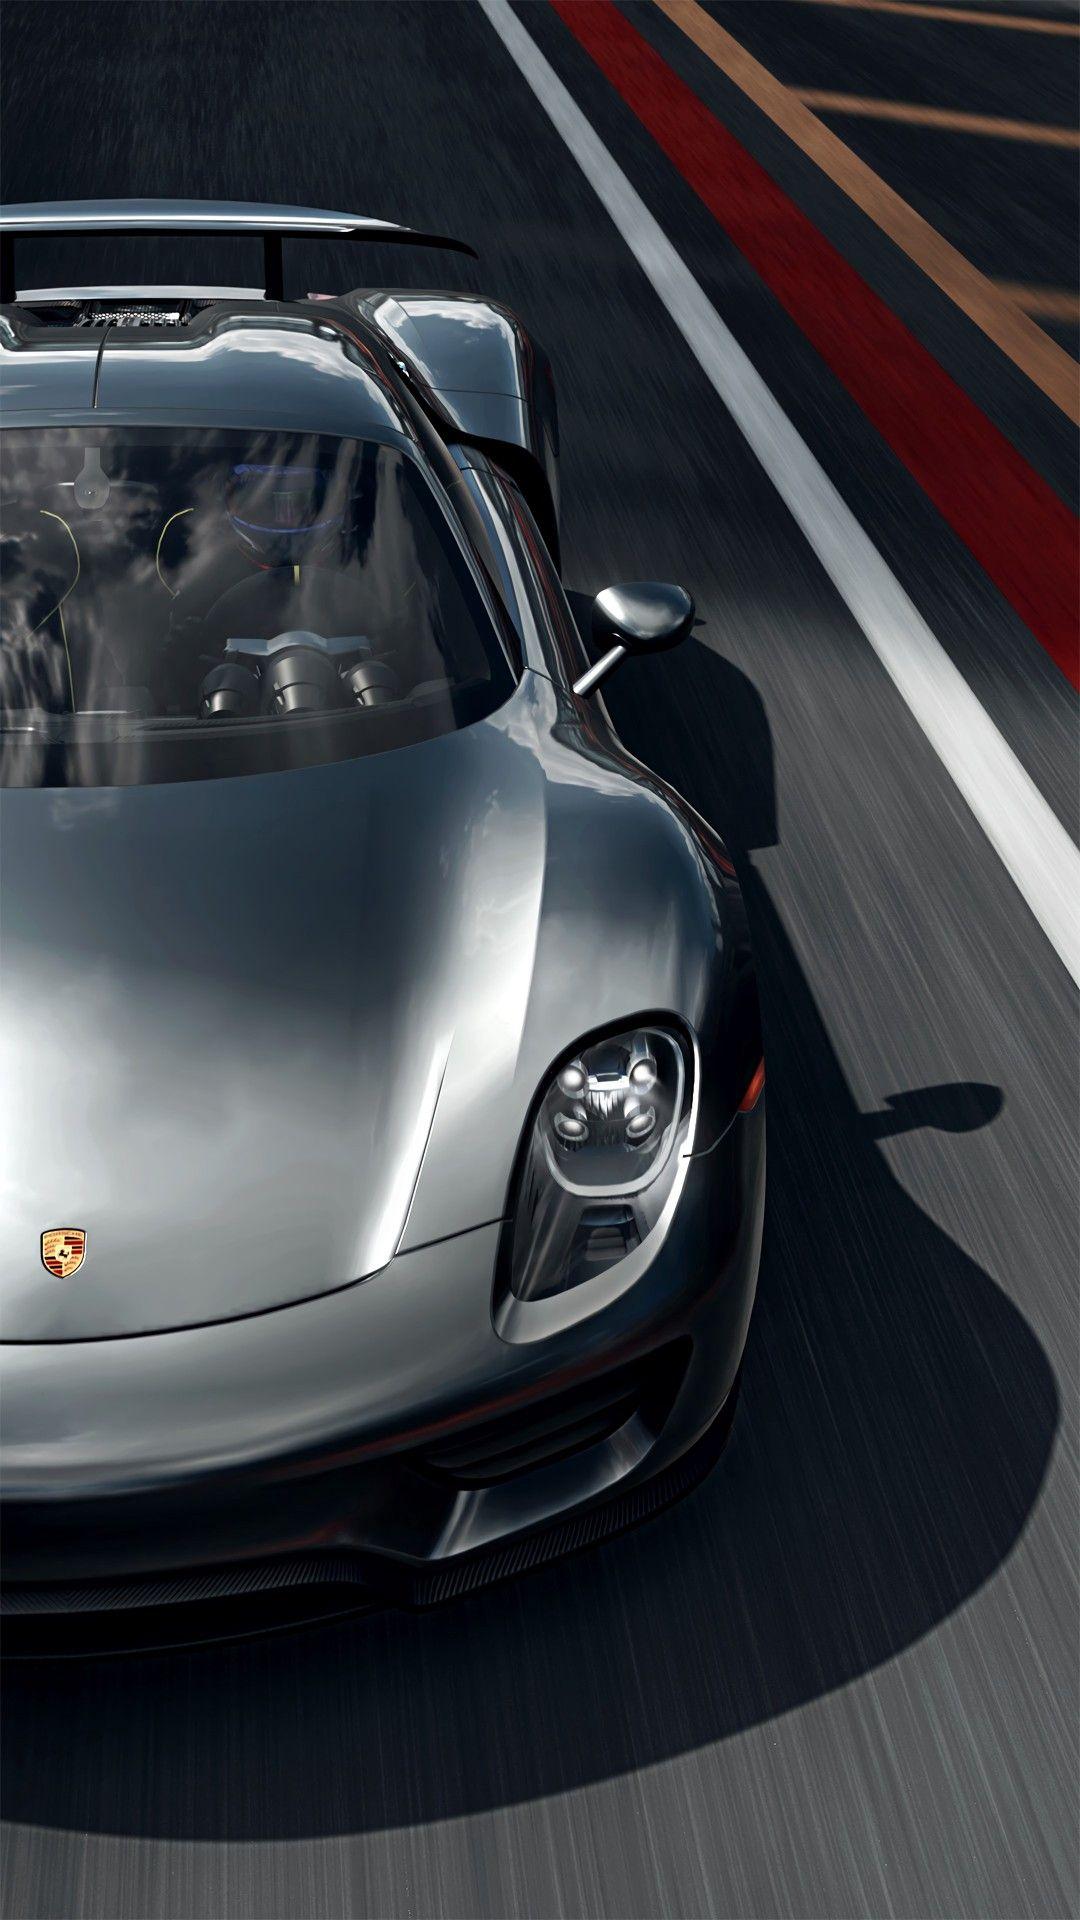 Pin by Veselin Tasev on Porsche 918 Spyder/Wiessach (With